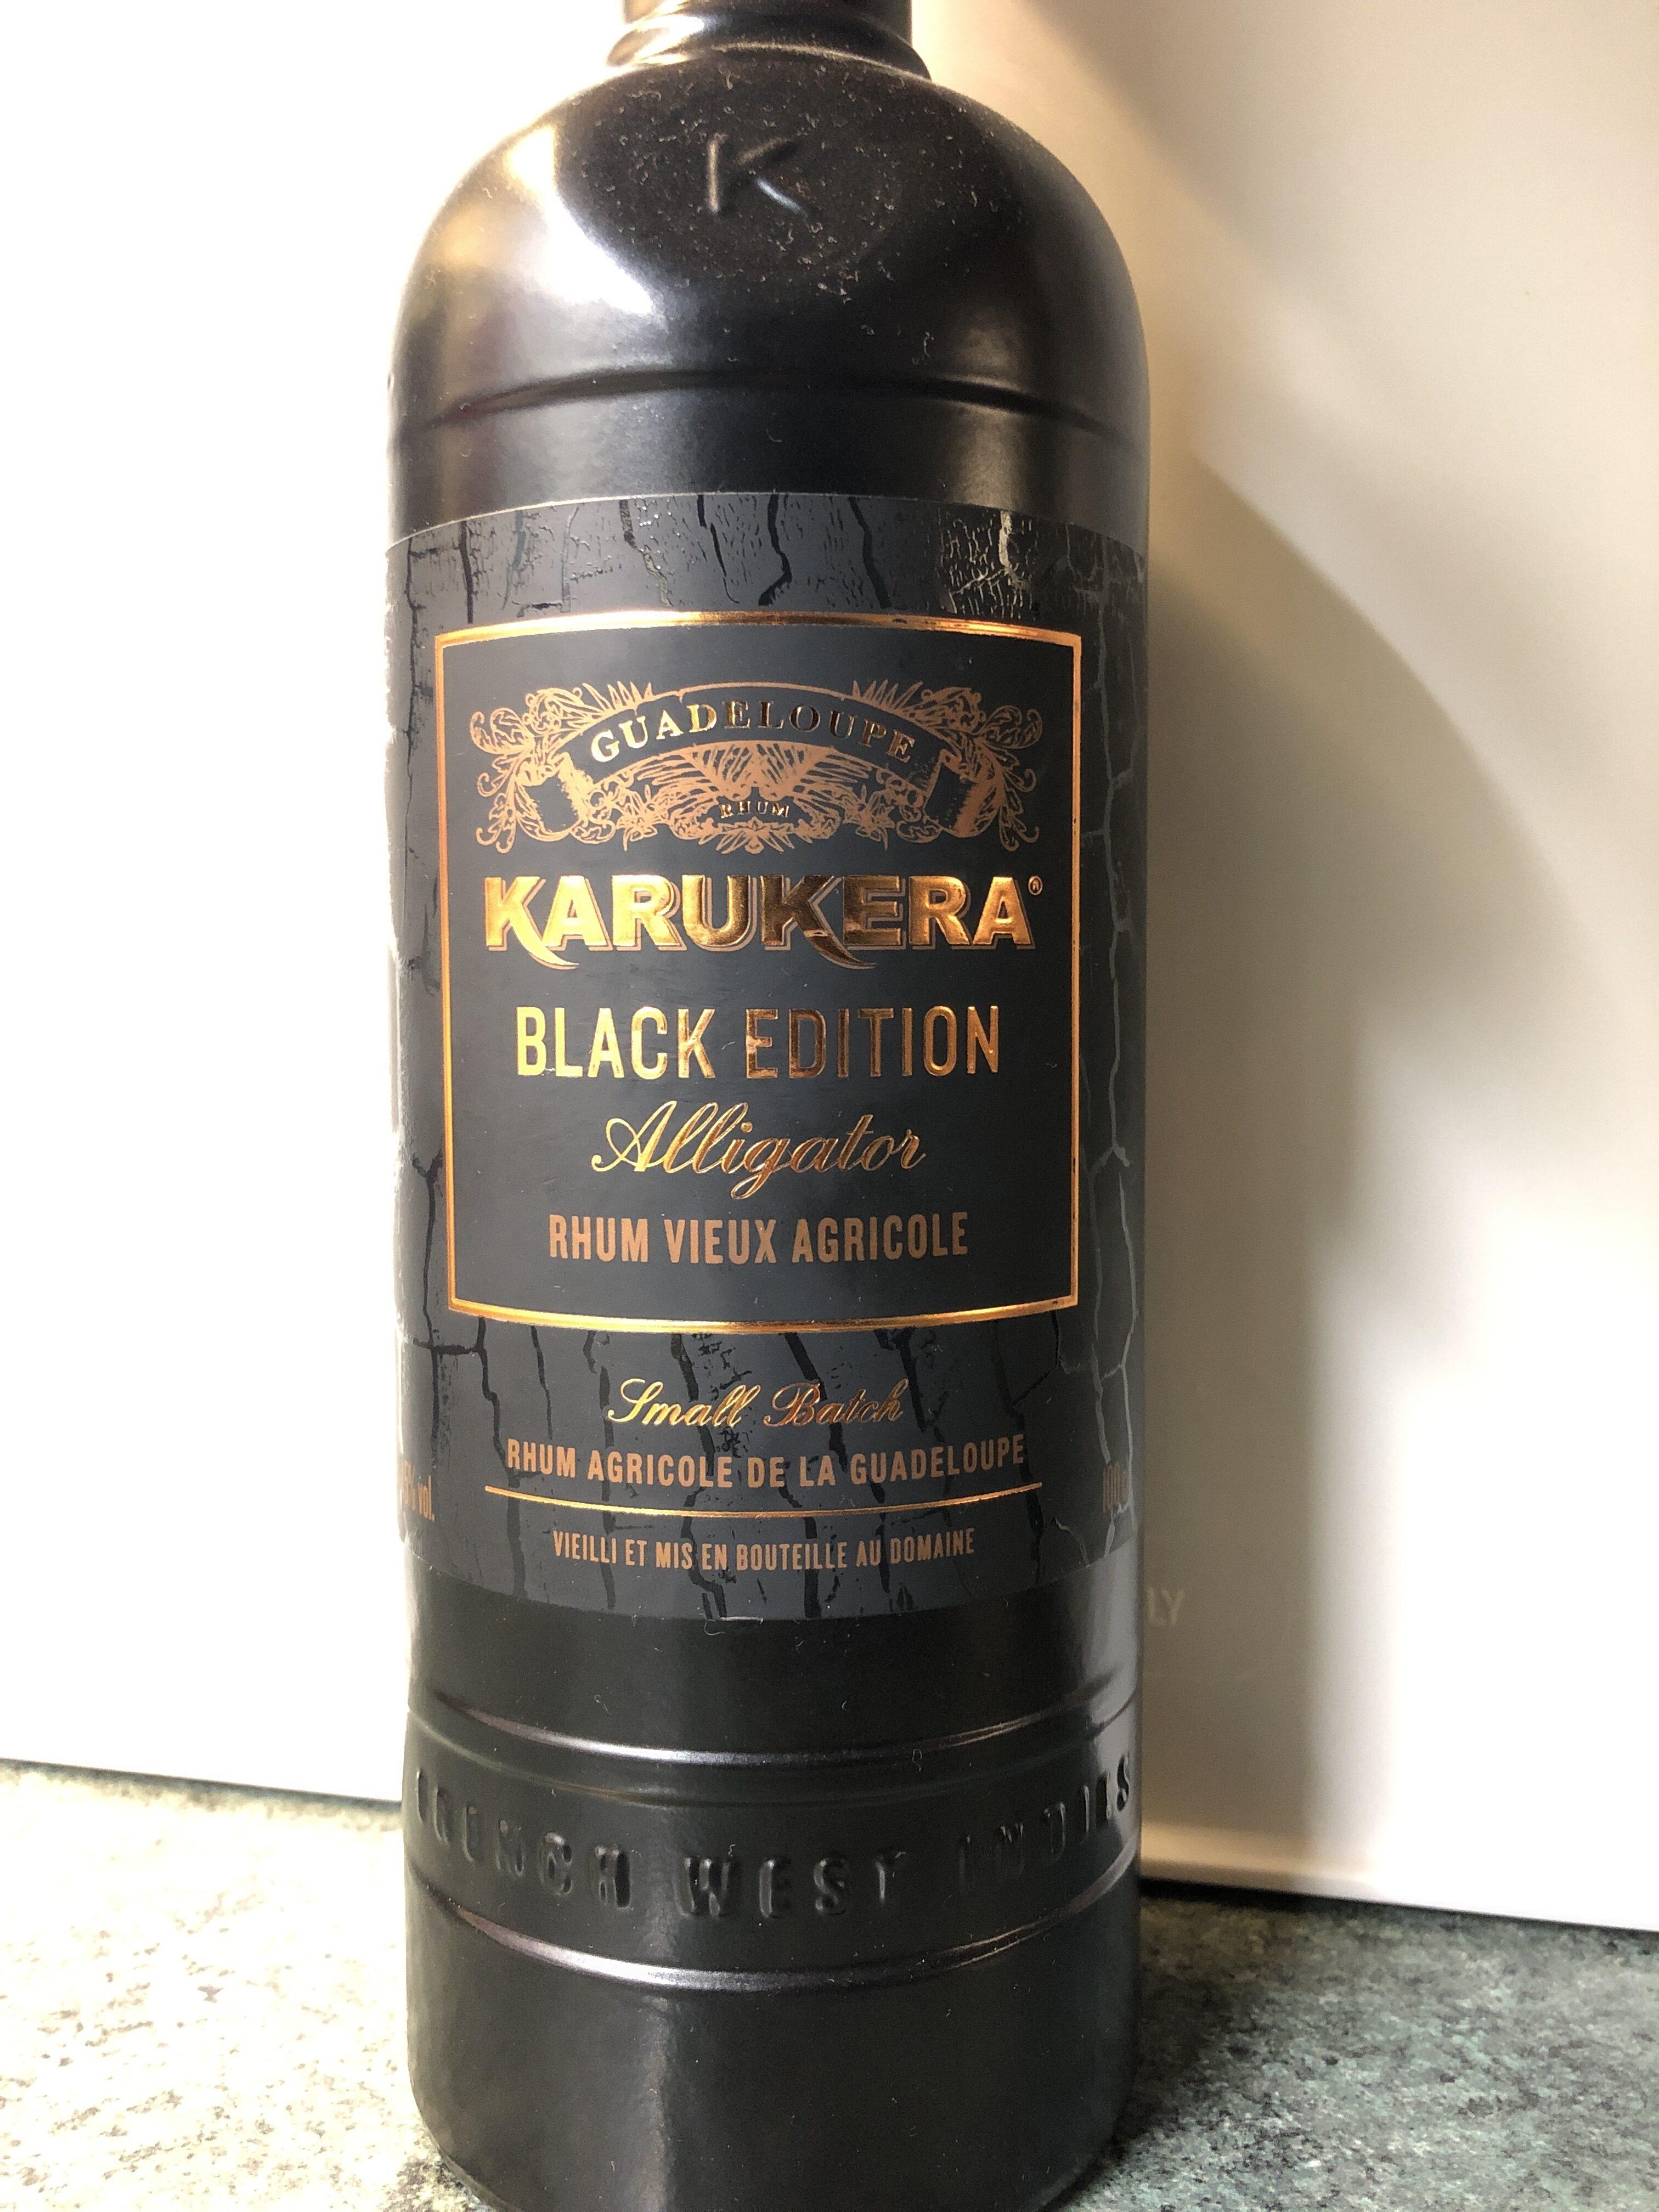 Rhum vieux agricole Karukera black édition Alligator - Produit - fr